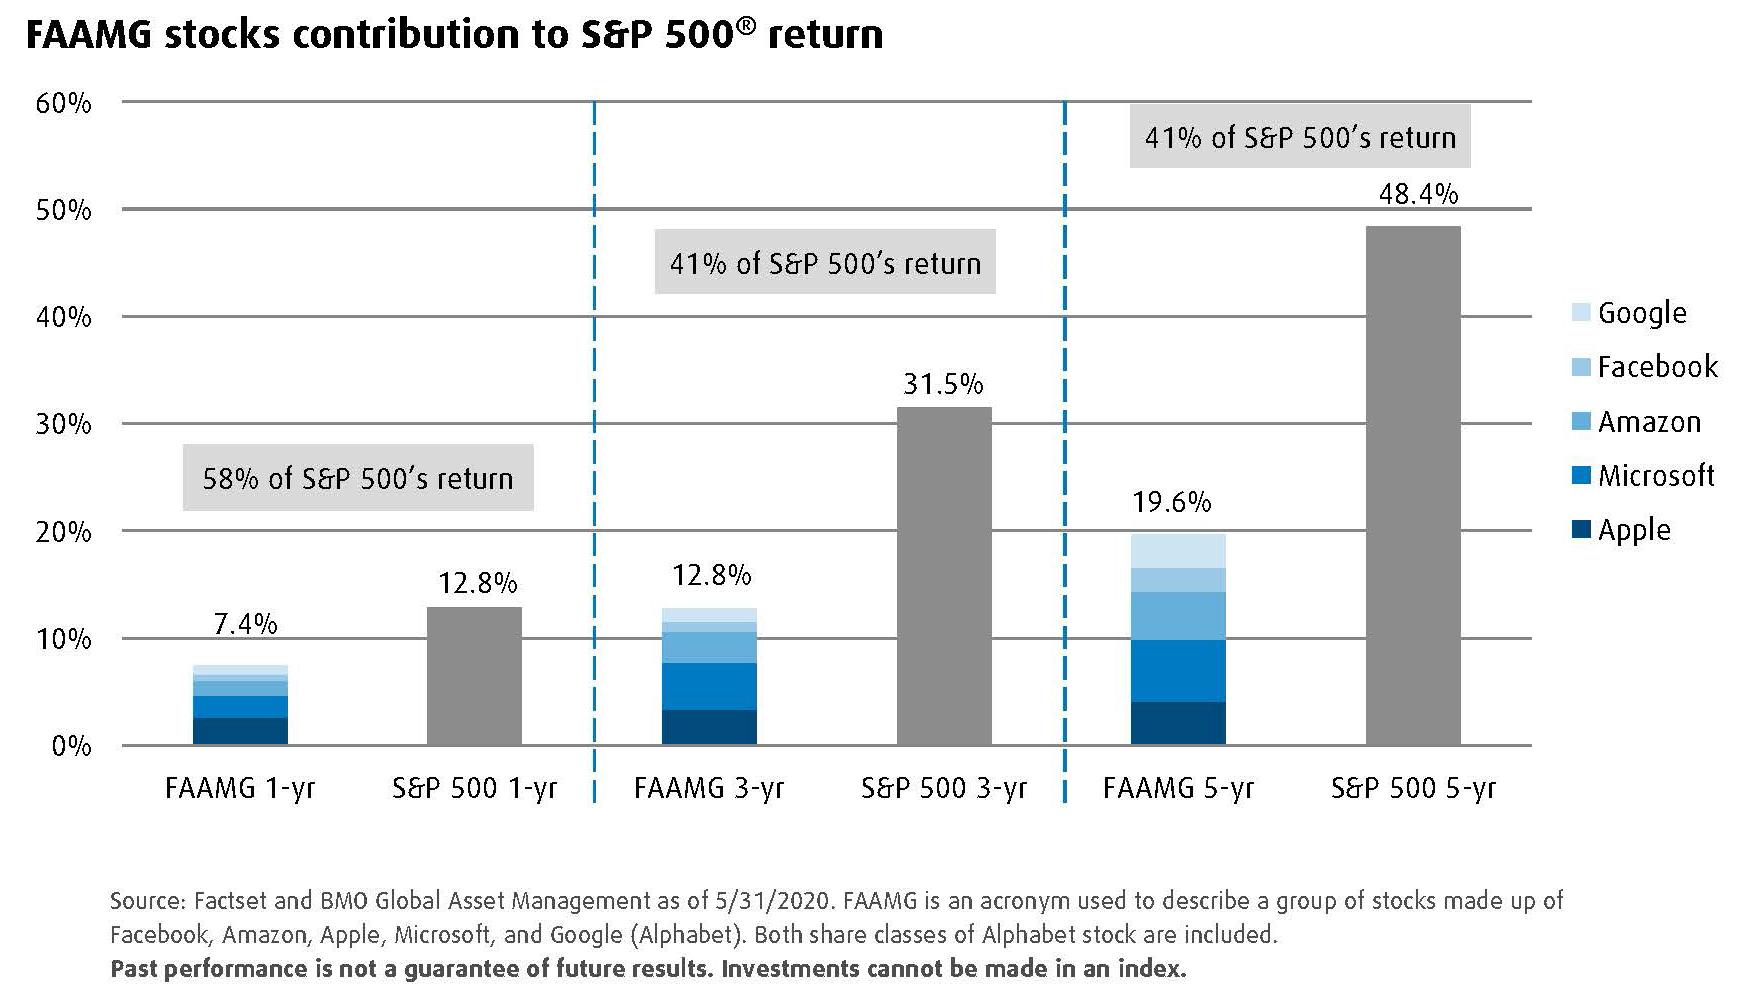 Graph presenting FAAMG stocks contribution to S&P 500 return